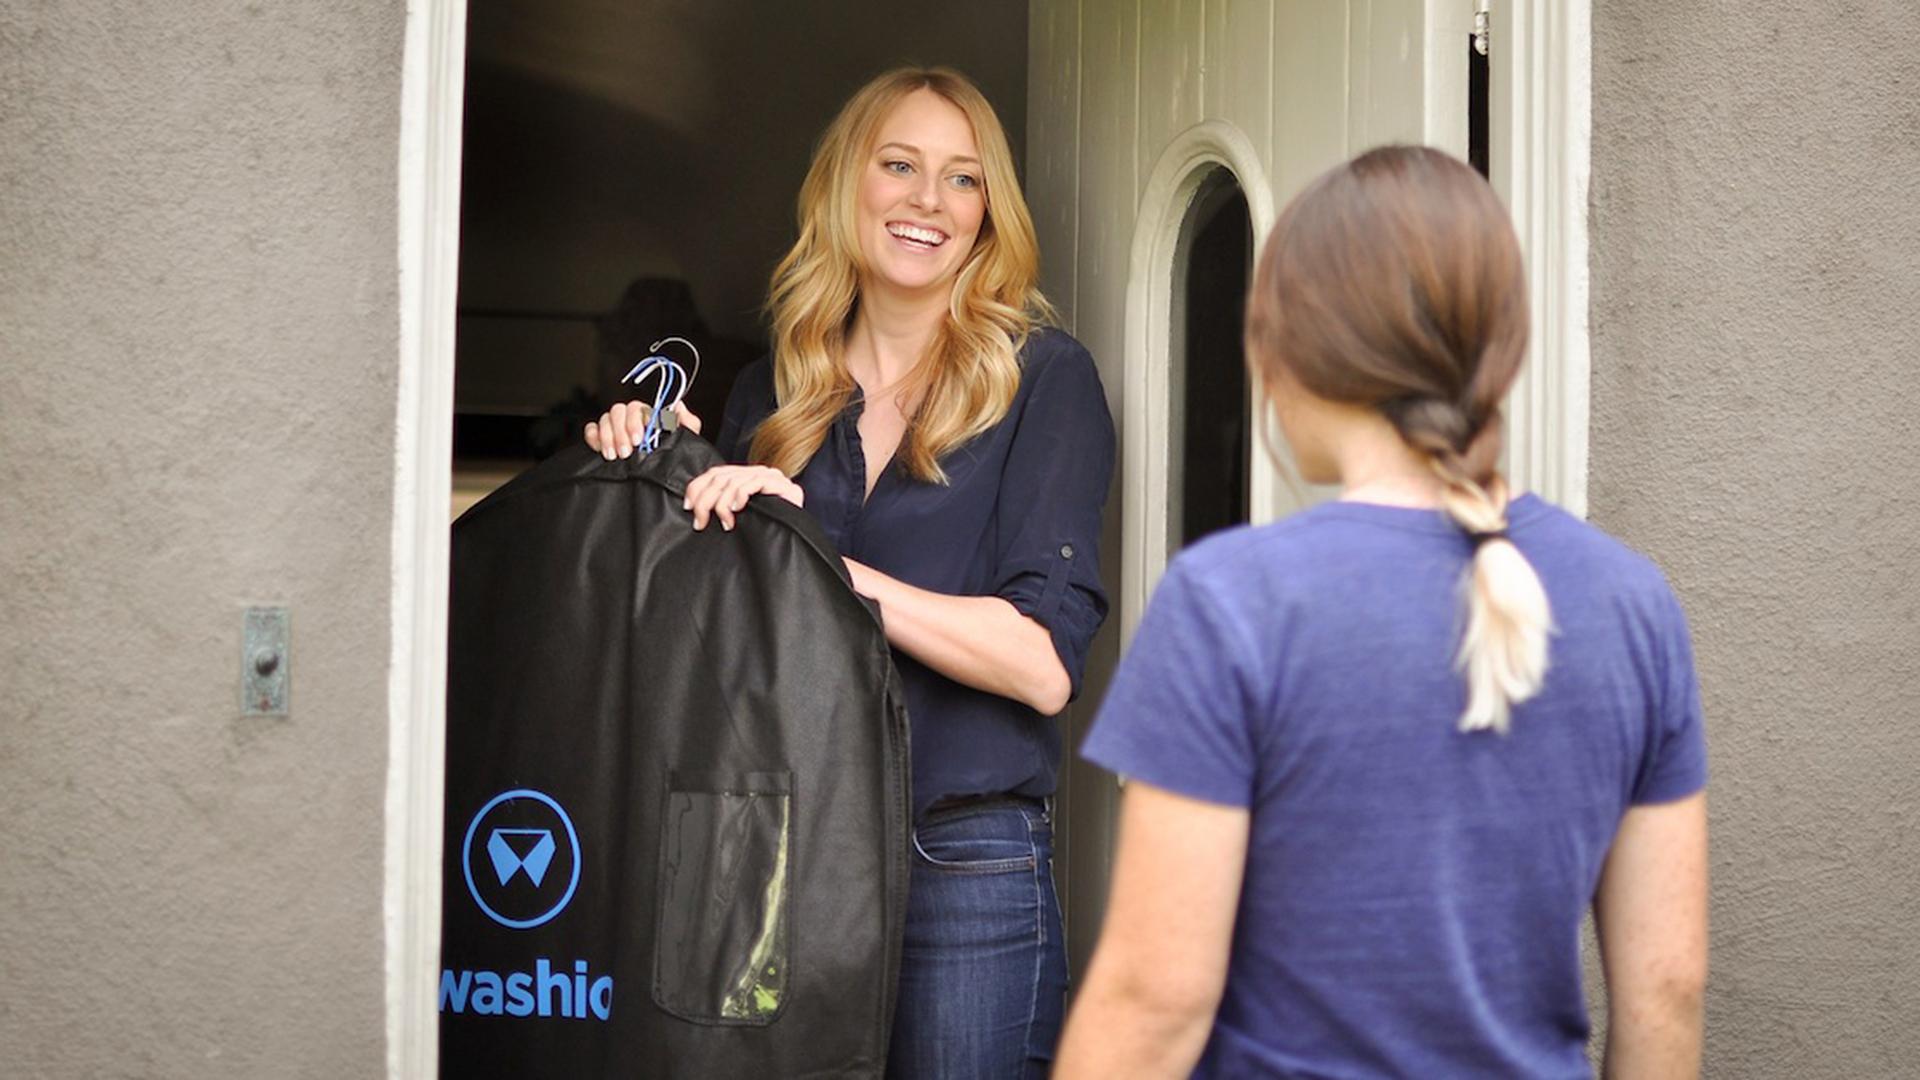 Washio, The On-Demand Laundry